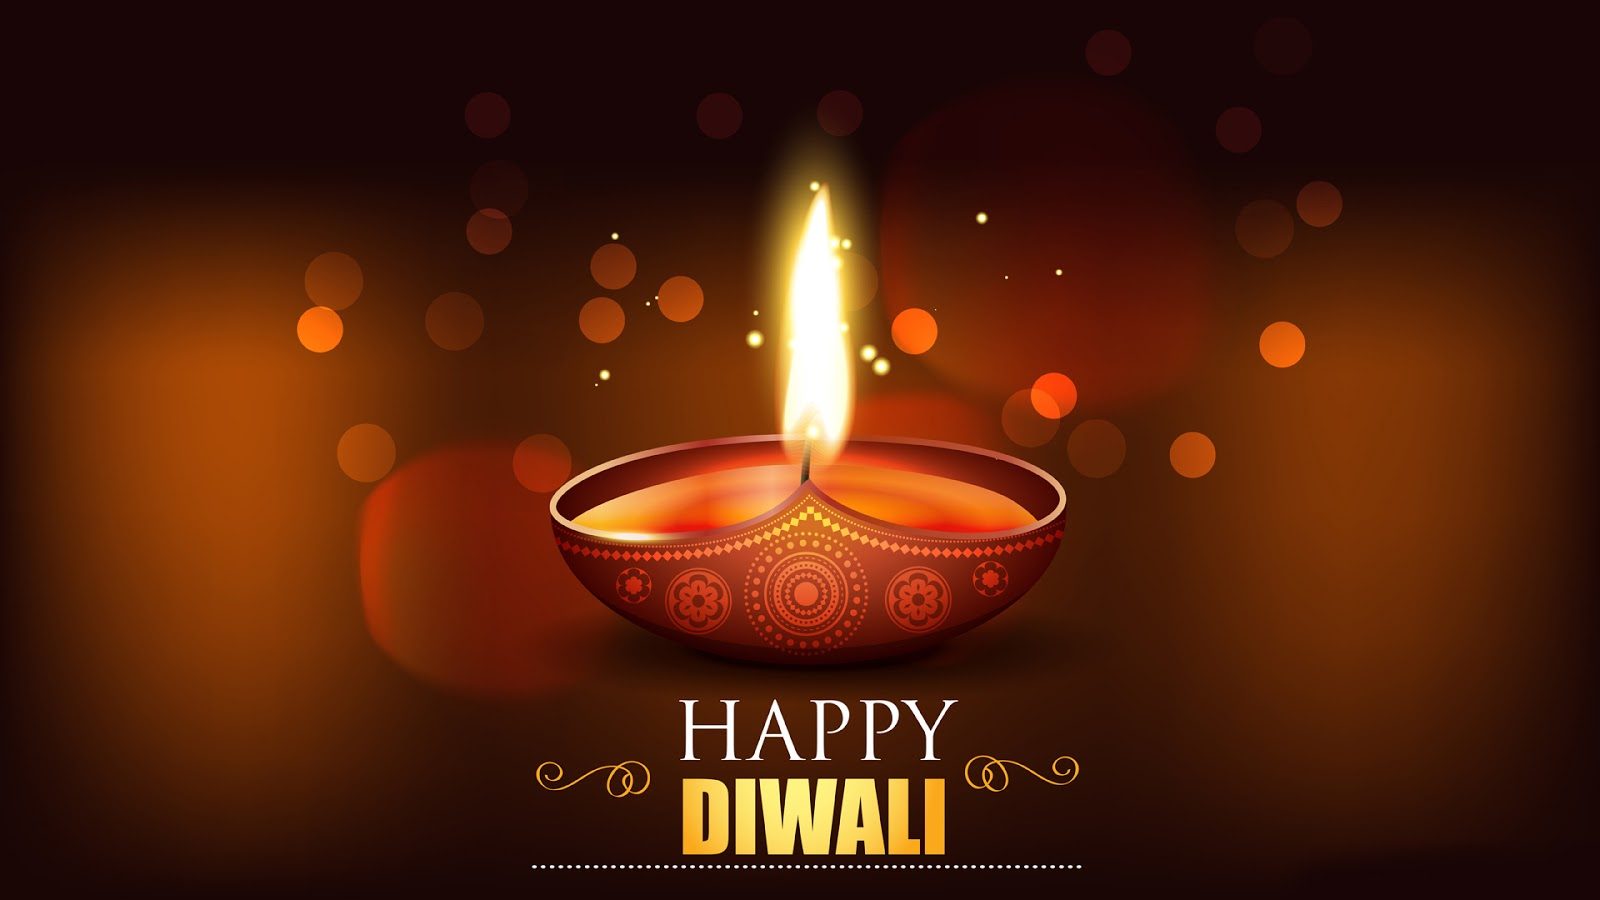 Happy birthday pictures happy birthday sms happy birthday wishes - Happy Diwali 2017 Images Wishes Quotes Whatsapp Status